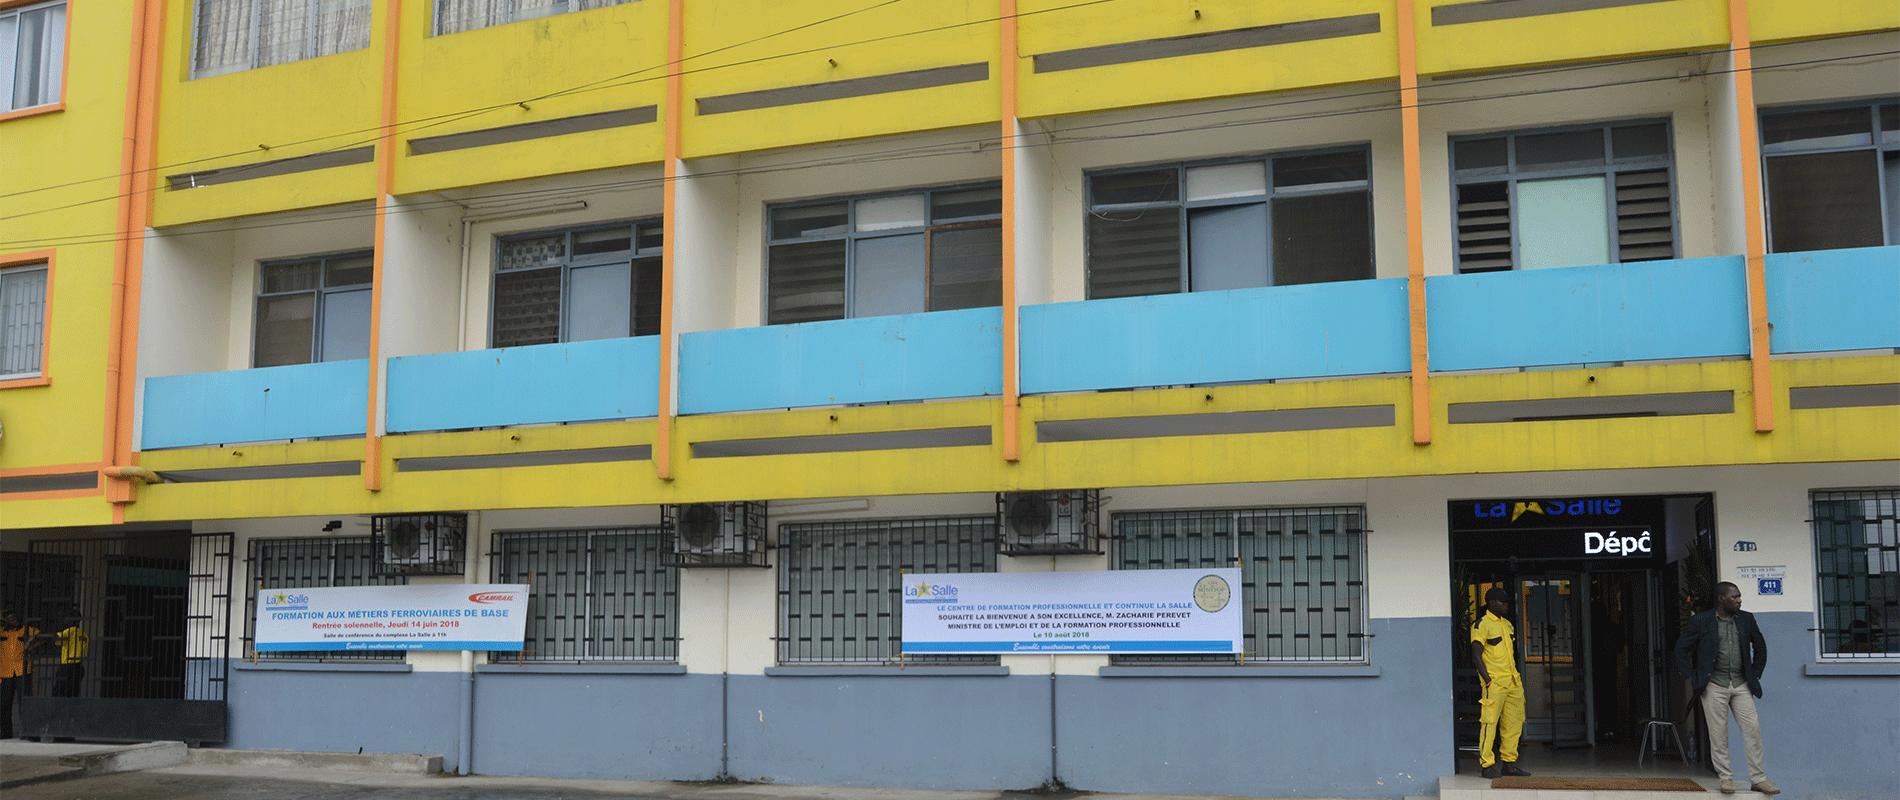 Le Campus La Salle